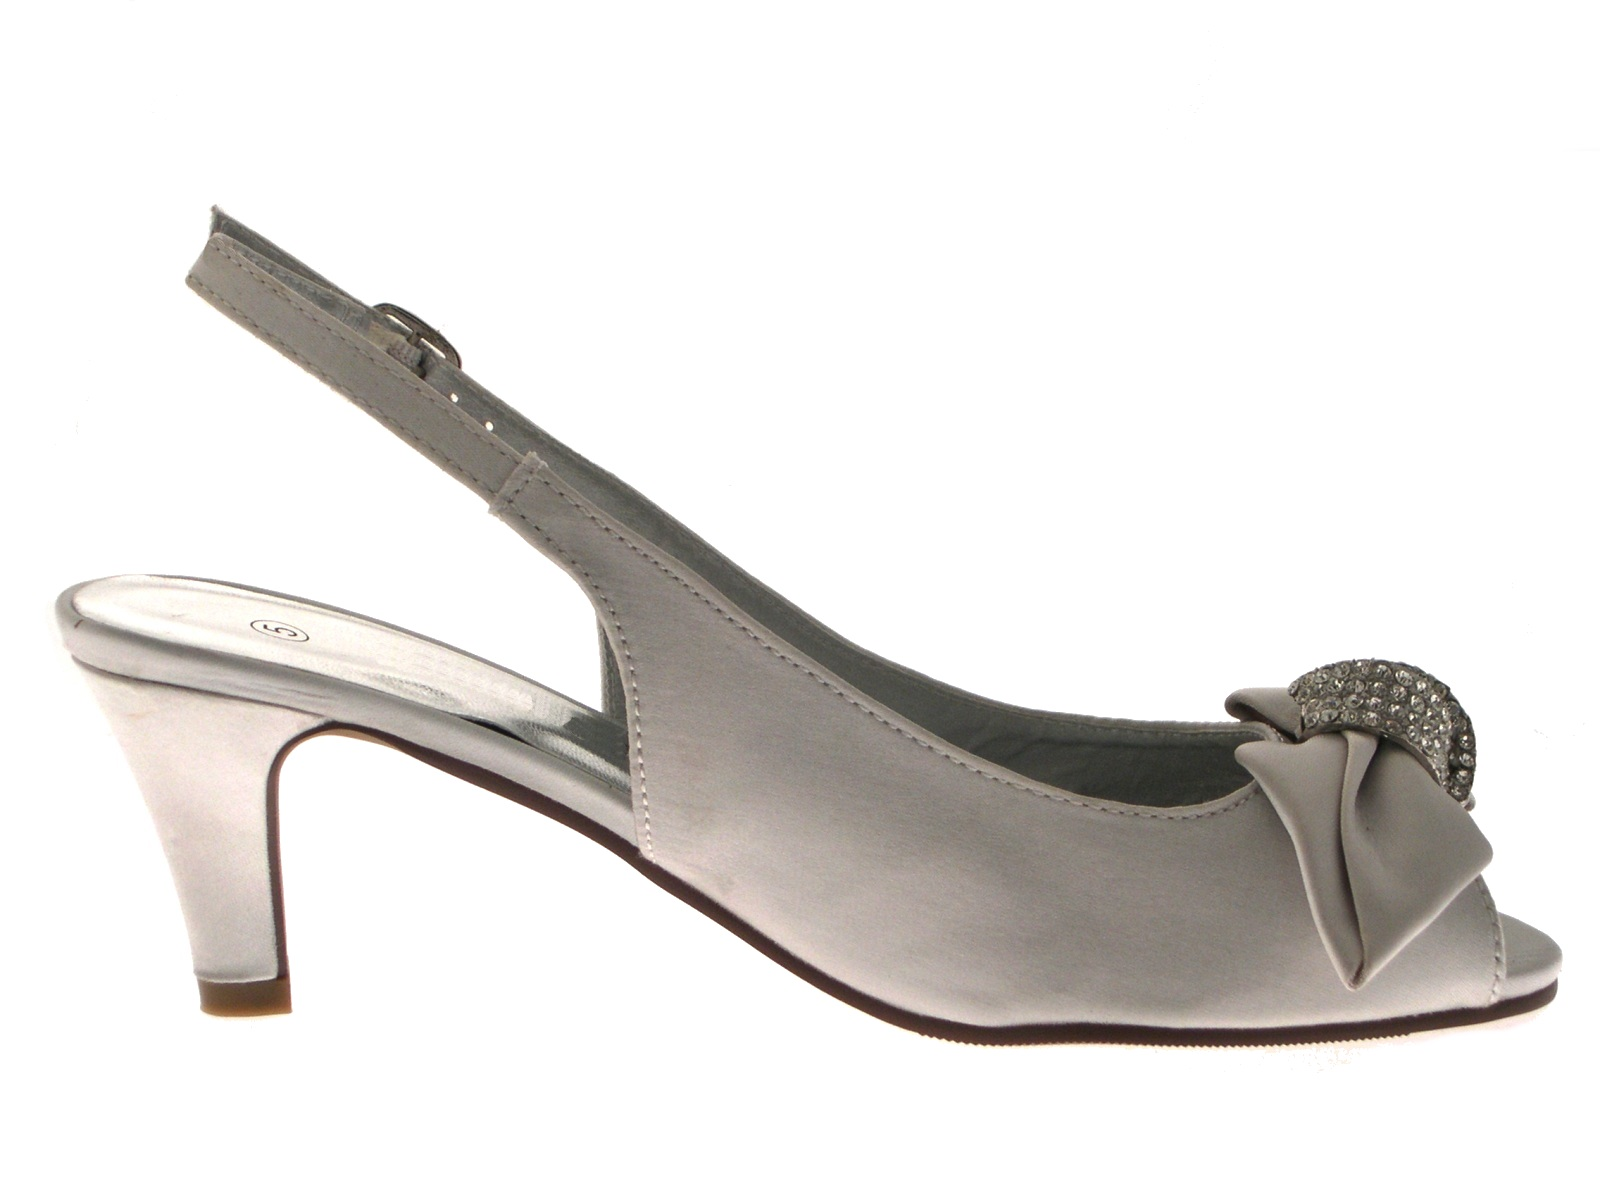 Womens Satin Diamante Low Heels Wider Bridal Comfort Wedding Shoes